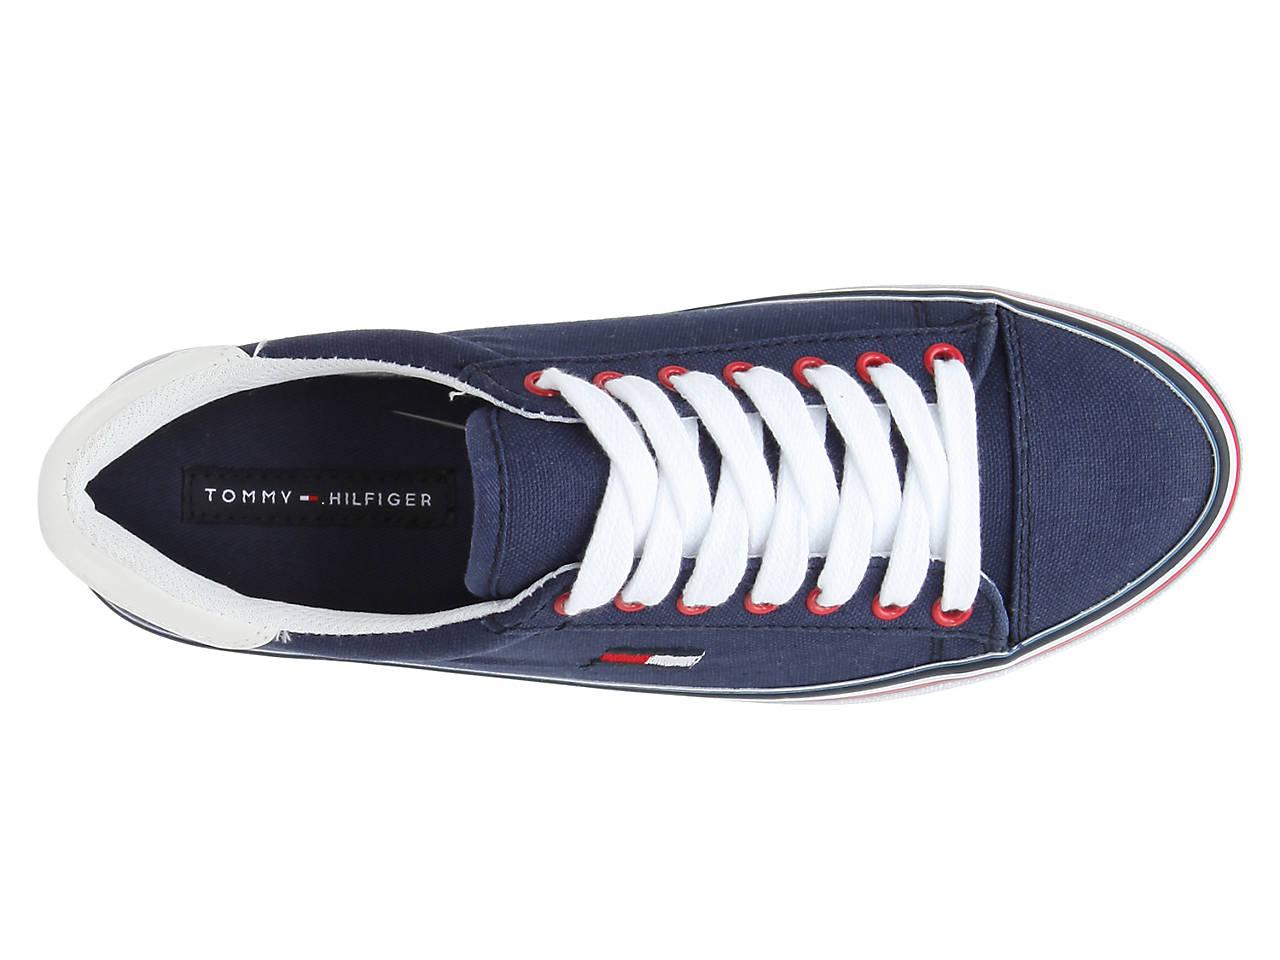 1278e623 Home · Women's Shoes · Sneakers; Fressian Sneaker. previous. Fressian  Sneaker. next